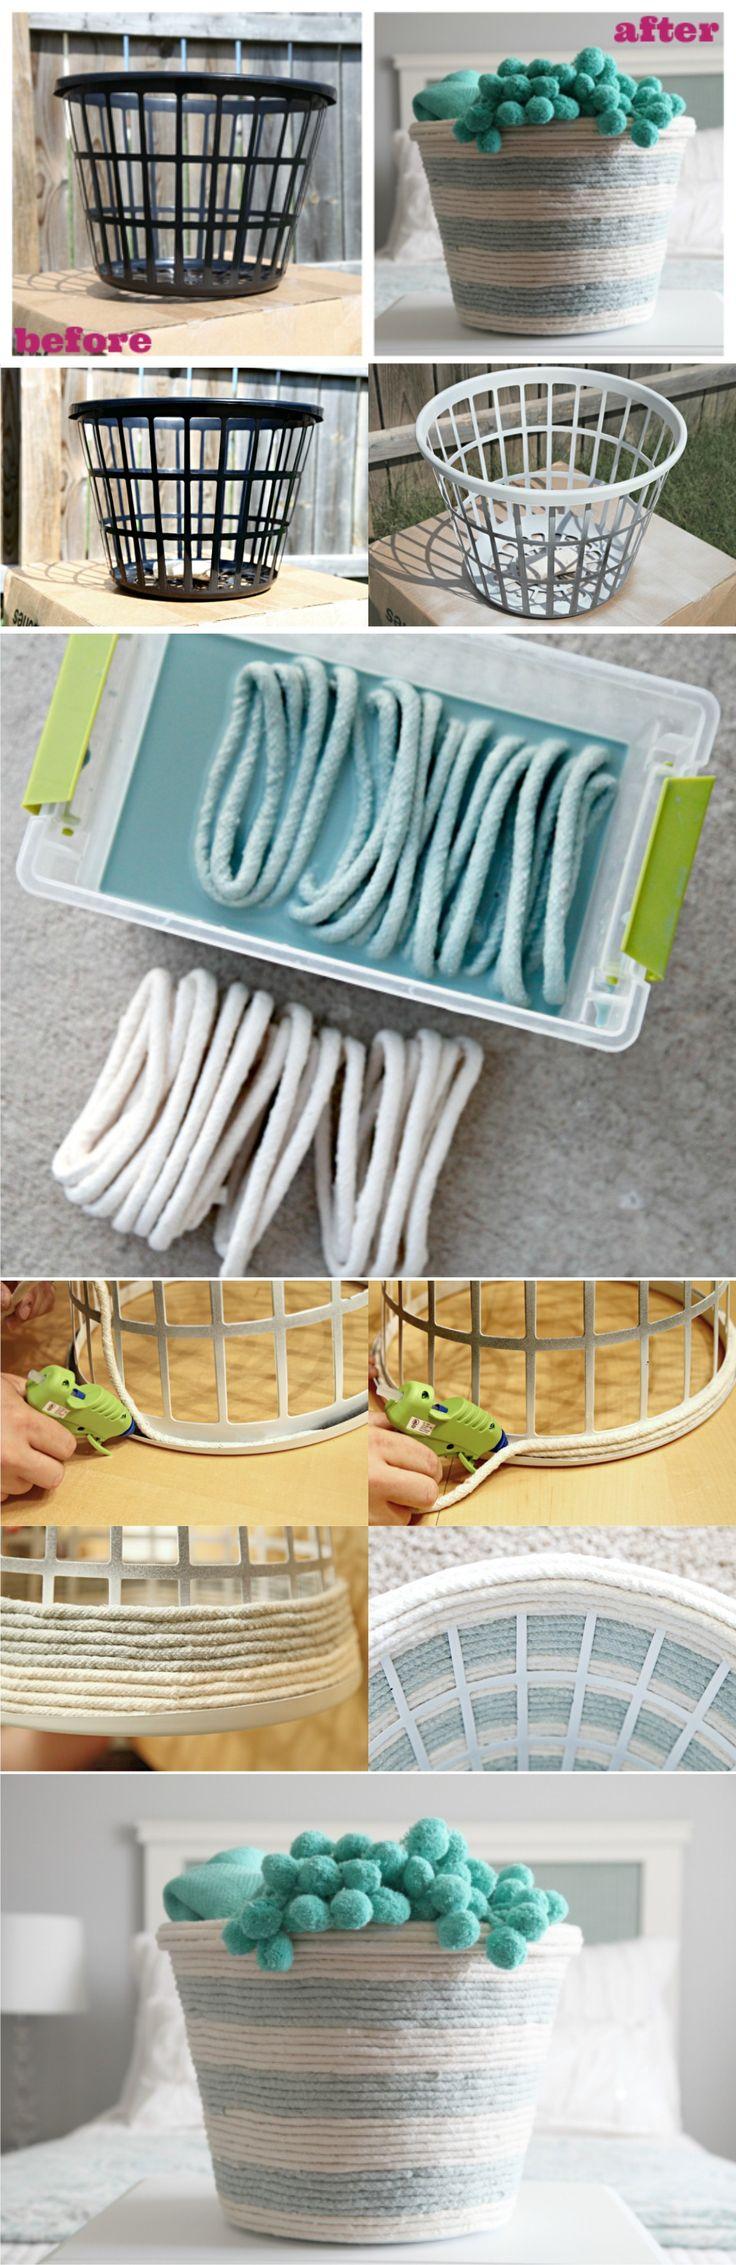 cesta da corda DIY engenhosa 1